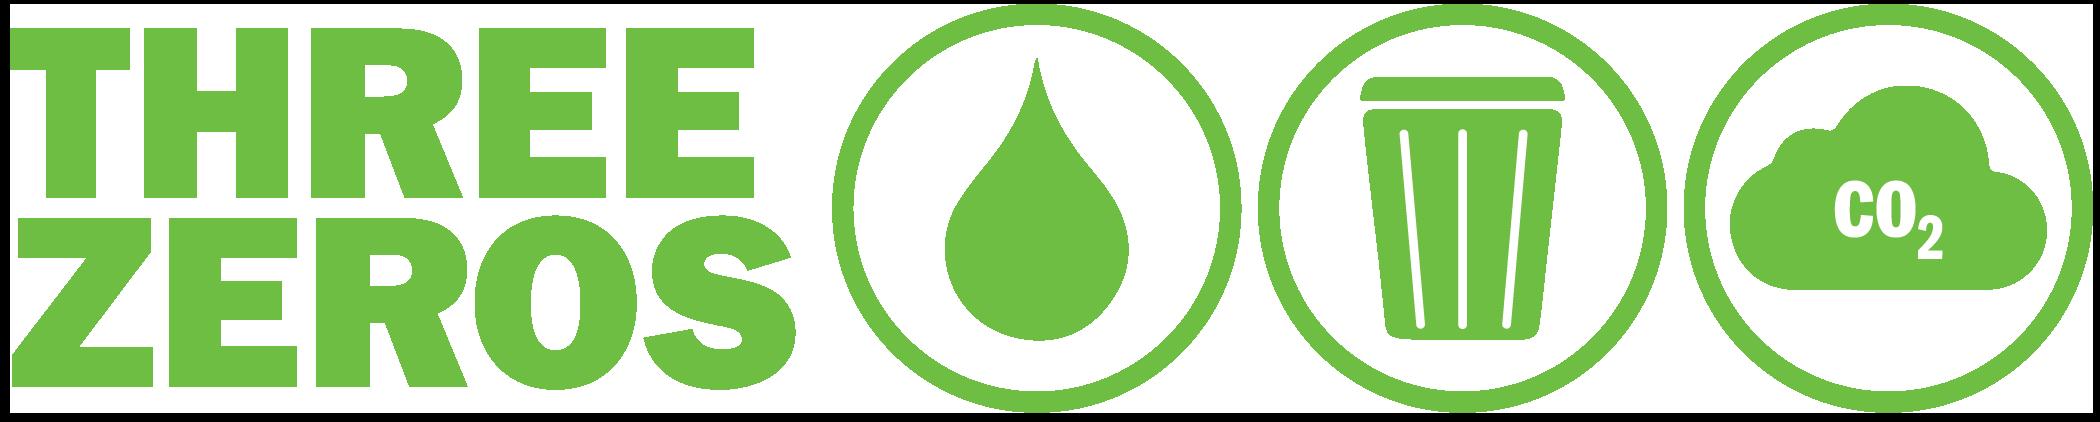 Three Zeros Environmental Initiative